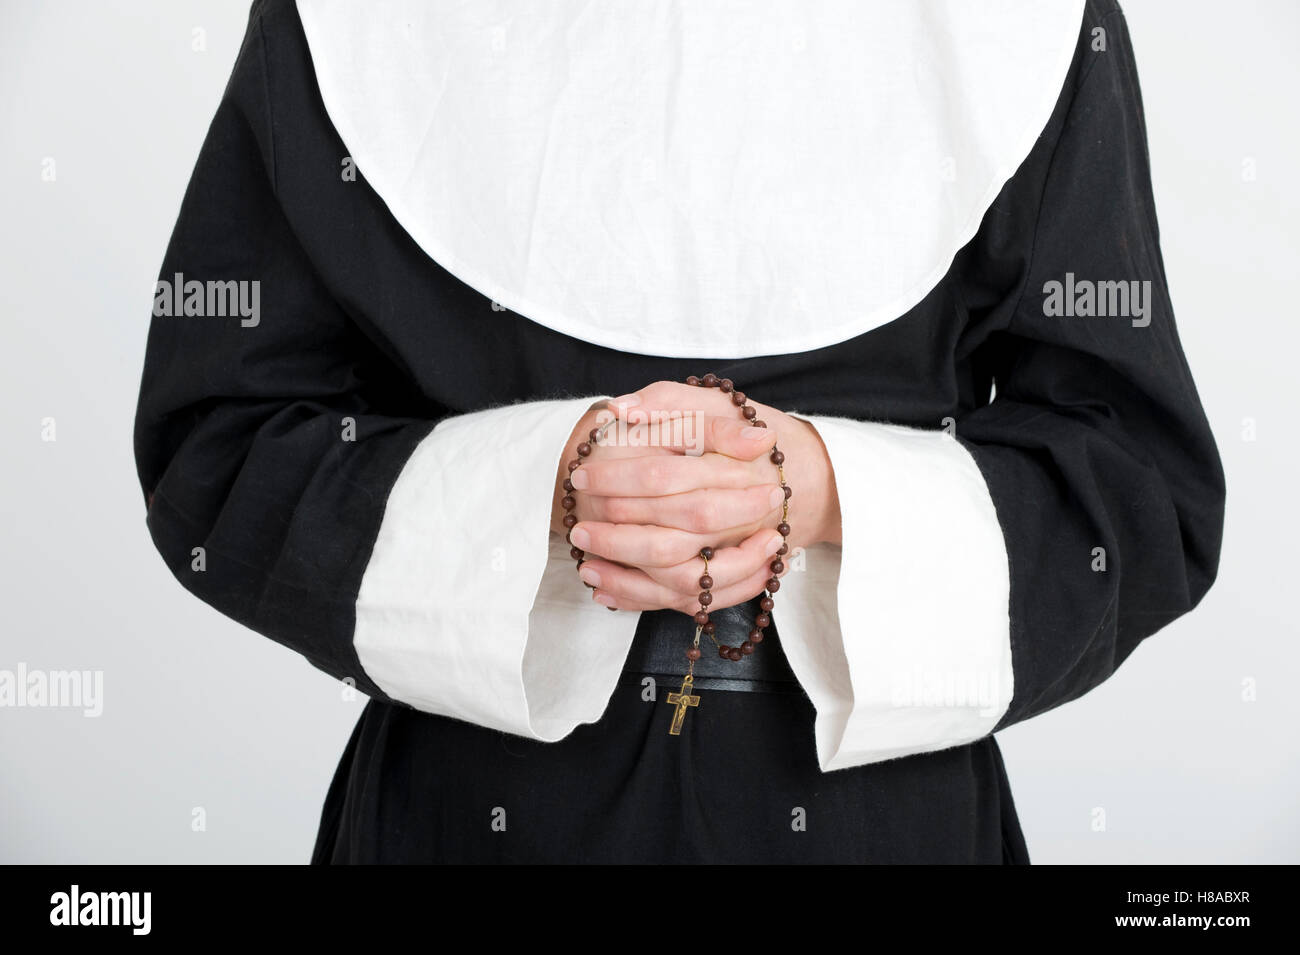 Nun praying the rosary - Stock Image